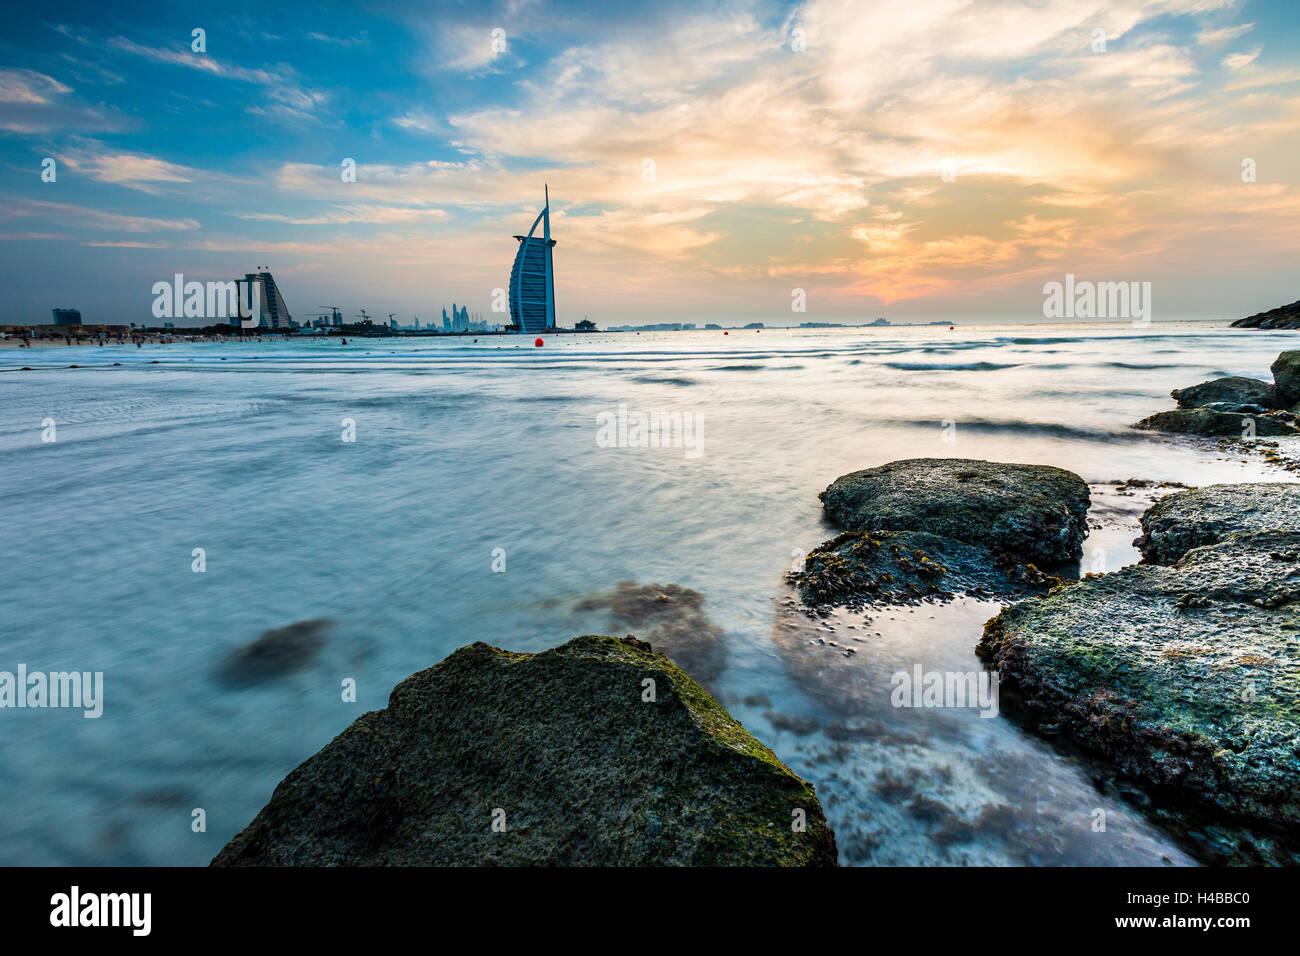 Luxus-Hotel Burj al Arab und Jumeirah Beach, Burj al ' Arab, Turm von den Arabern, Dubai, Emirat von Dubai, Stockbild